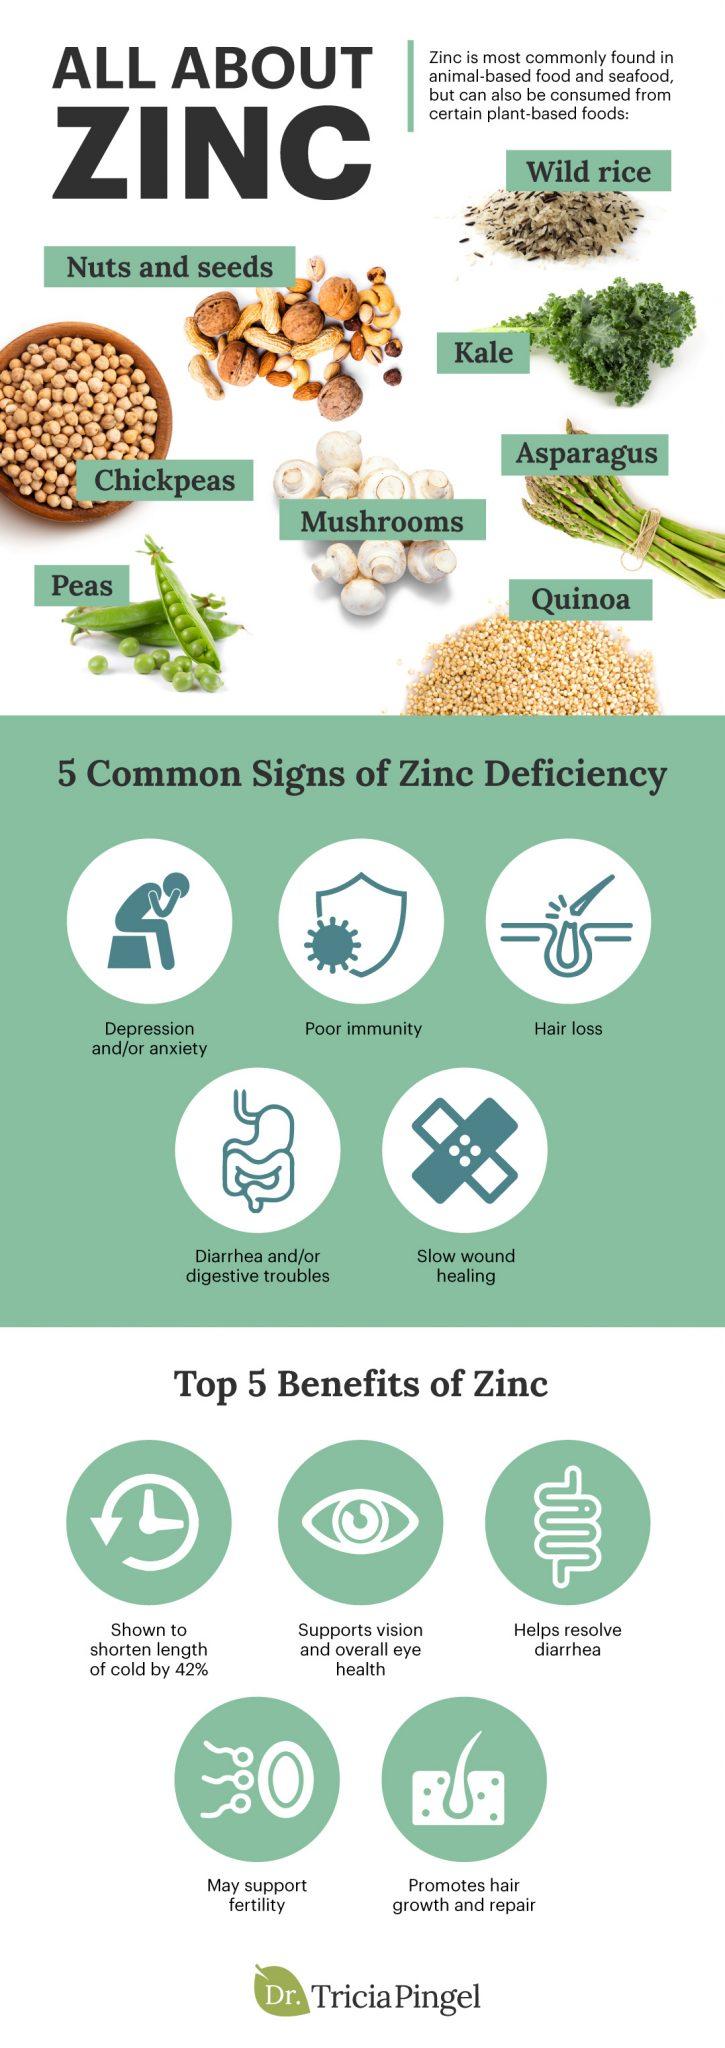 Zinc benefits - Dr. Pingel